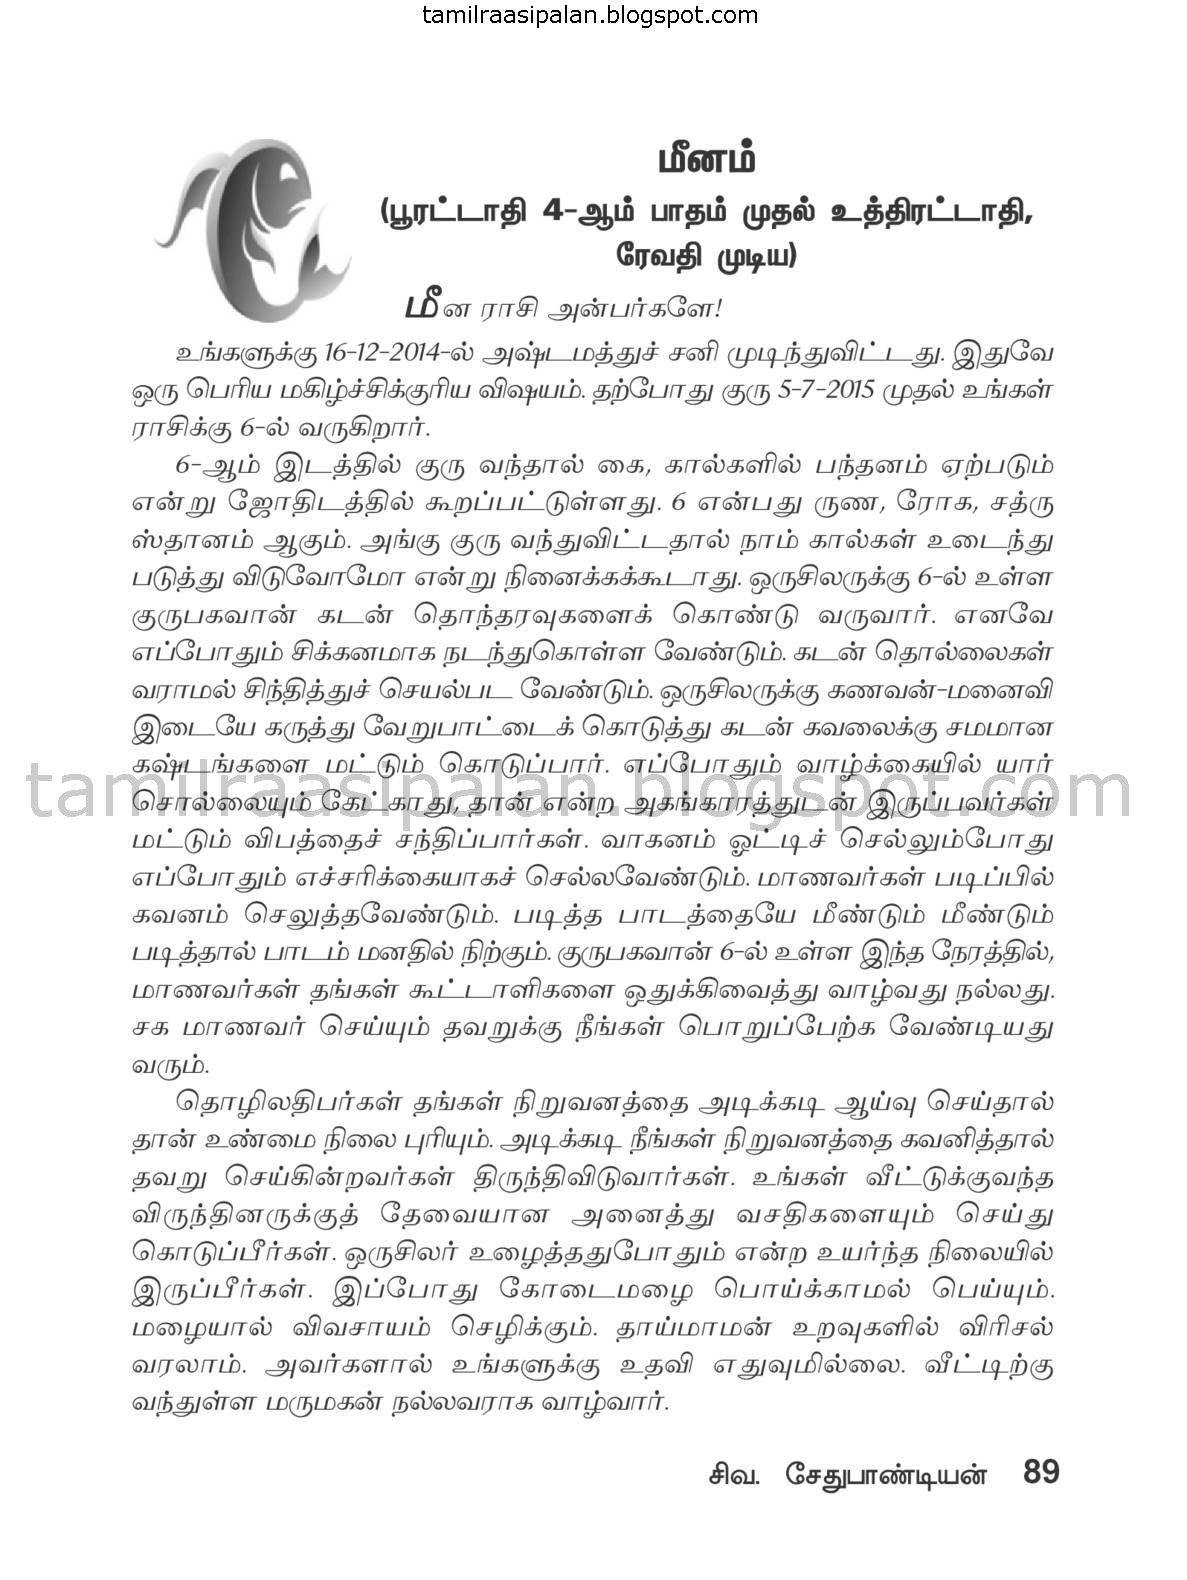 Guru peyarchi 8 pages detailed forecast for meenam raasi rasipalan